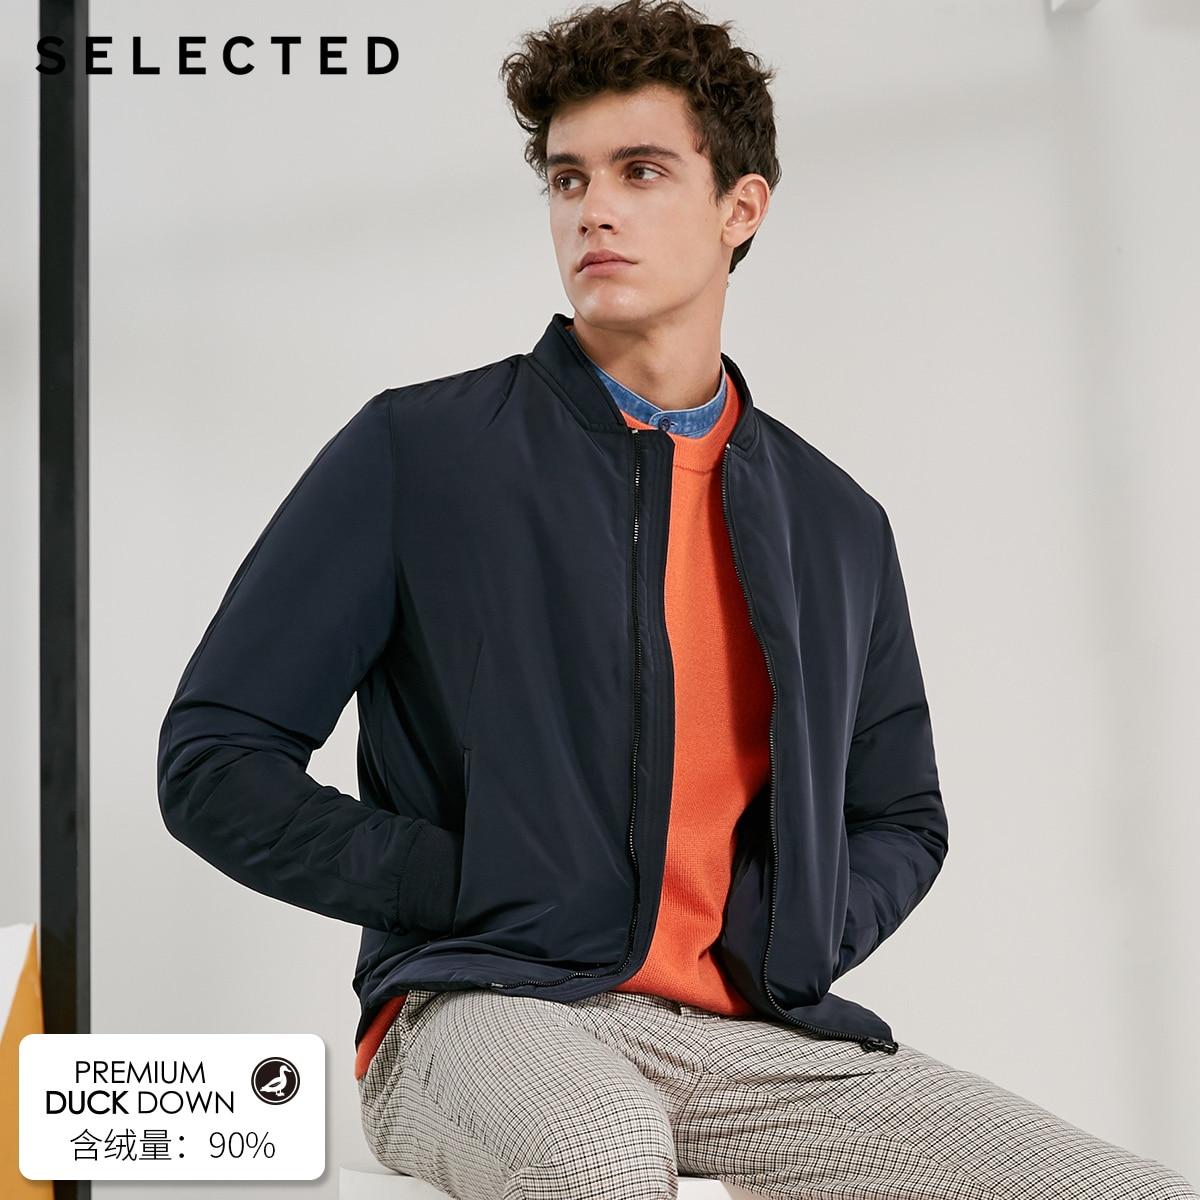 Plyesxale Brand Mens Summer Linen Blazers Elegant Man Blazer Casual Suit Jacket Stylish Letter Printed Blazer